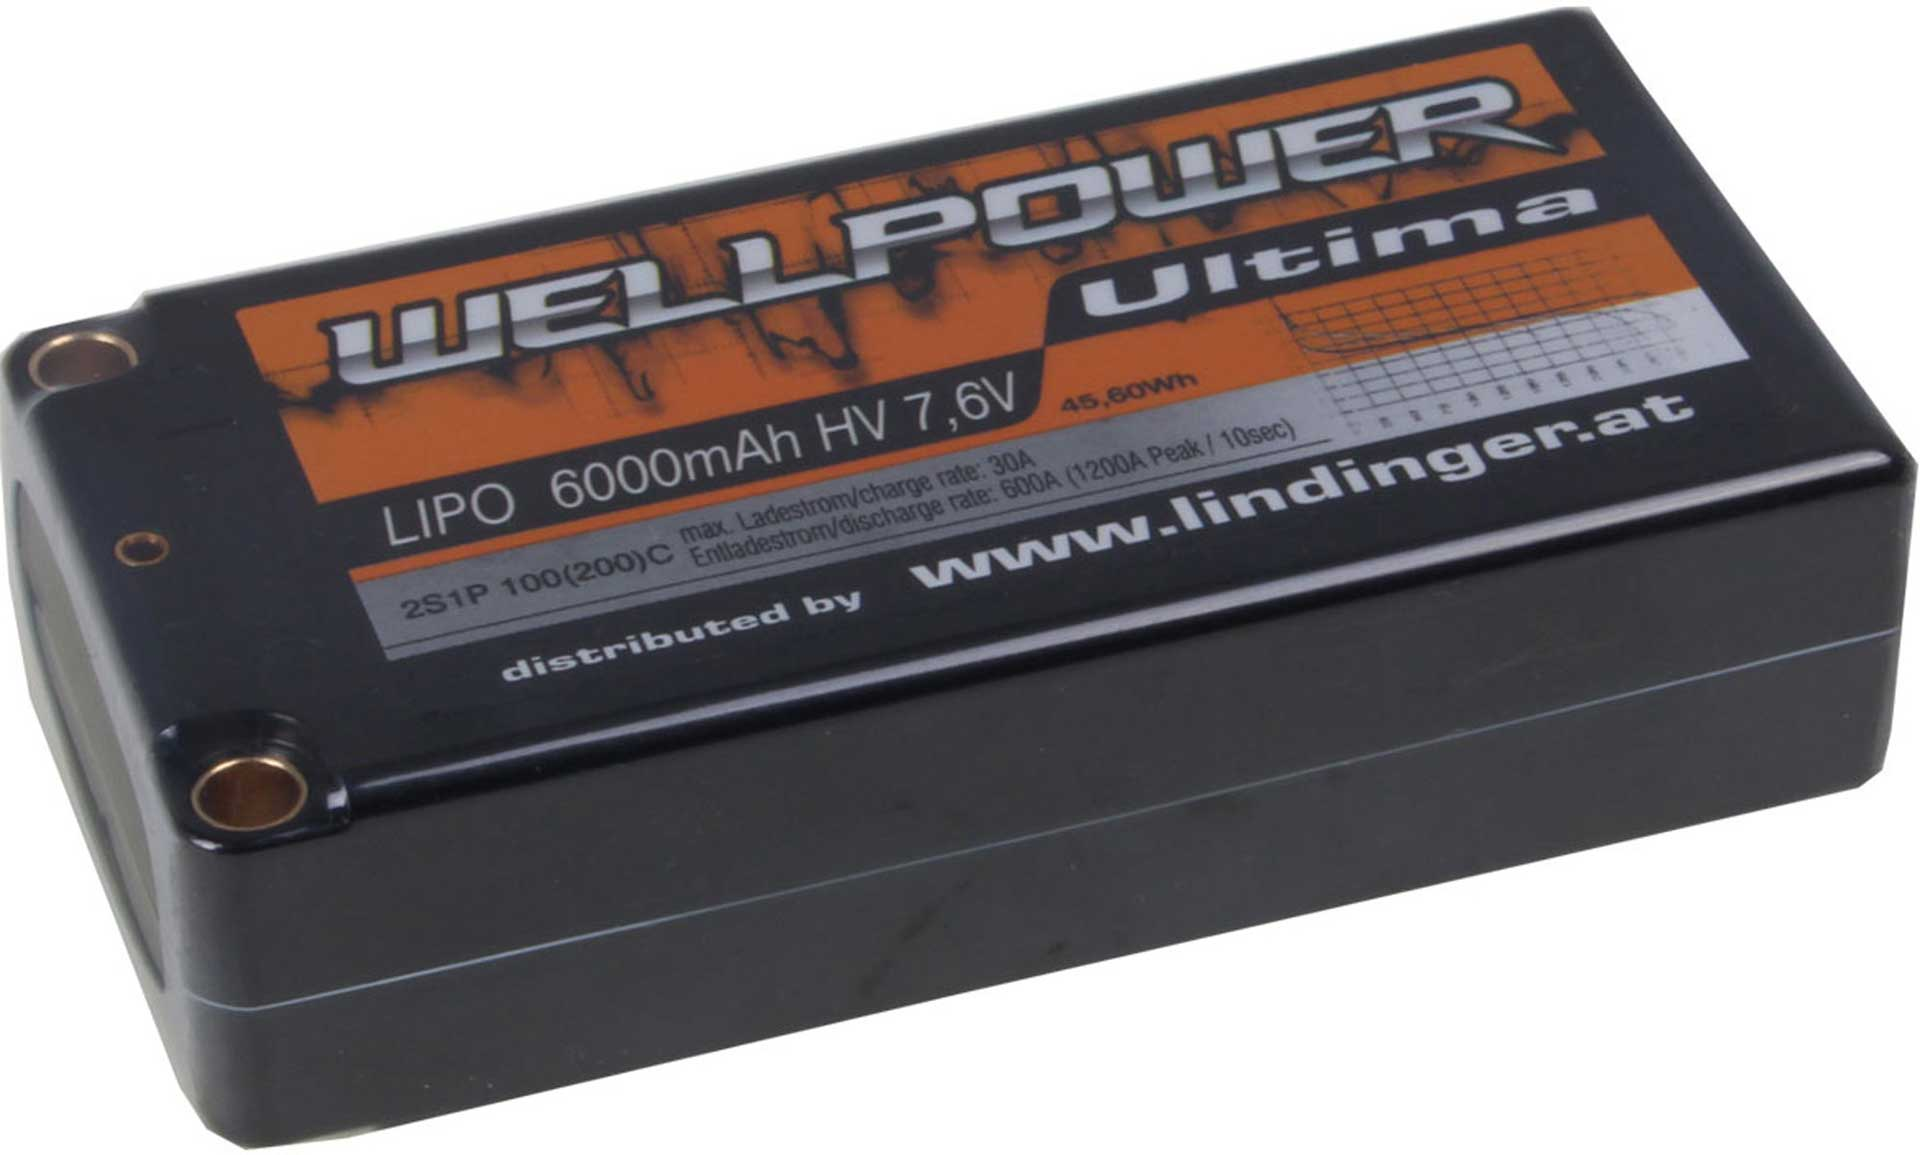 WELLPOWER LIPO AKKU ULTIMA CAR 6000 MAH / 7,6 VOLT HV 2S1P 100/200C SHORTY